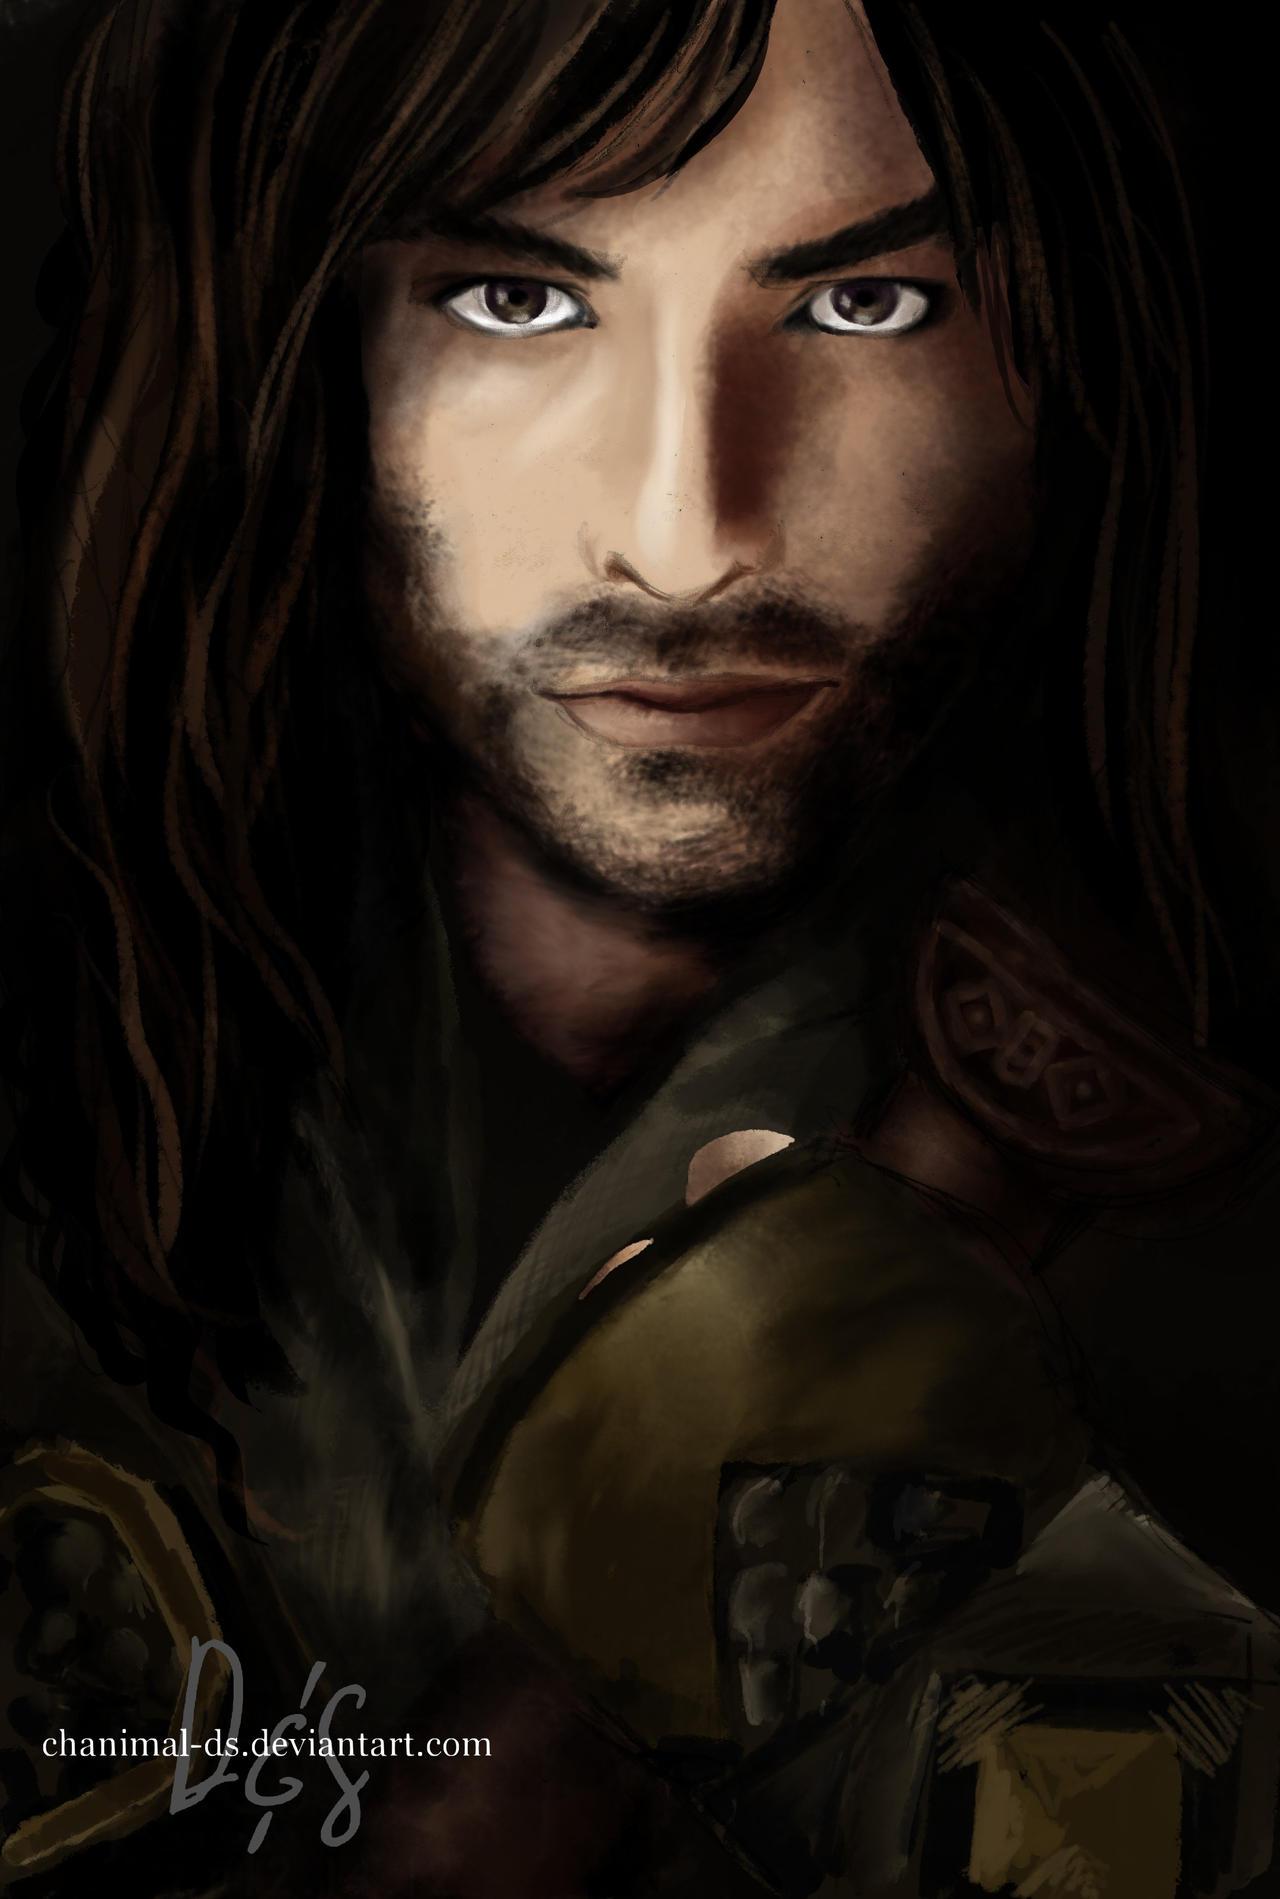 Kili The Hobbit Actor | www.imgkid.com - The Image Kid Has It!